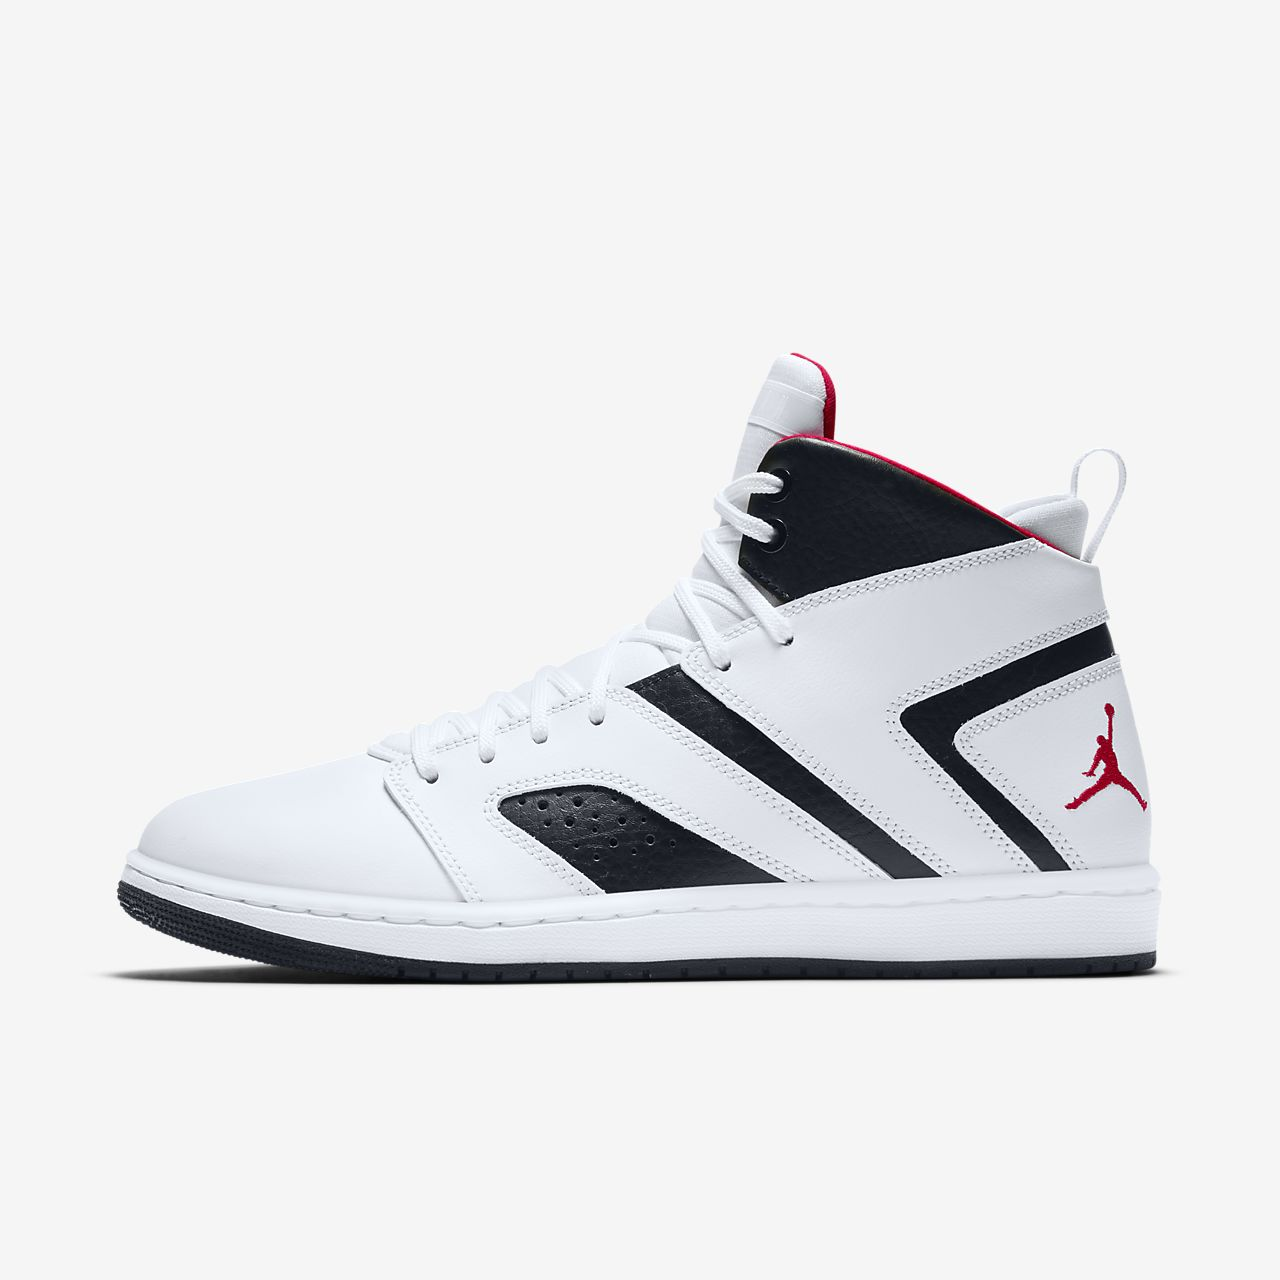 Jordan Hommes Chaussures De Basket-ball De La Légende De Vol Nike 21tQ4Ymi3